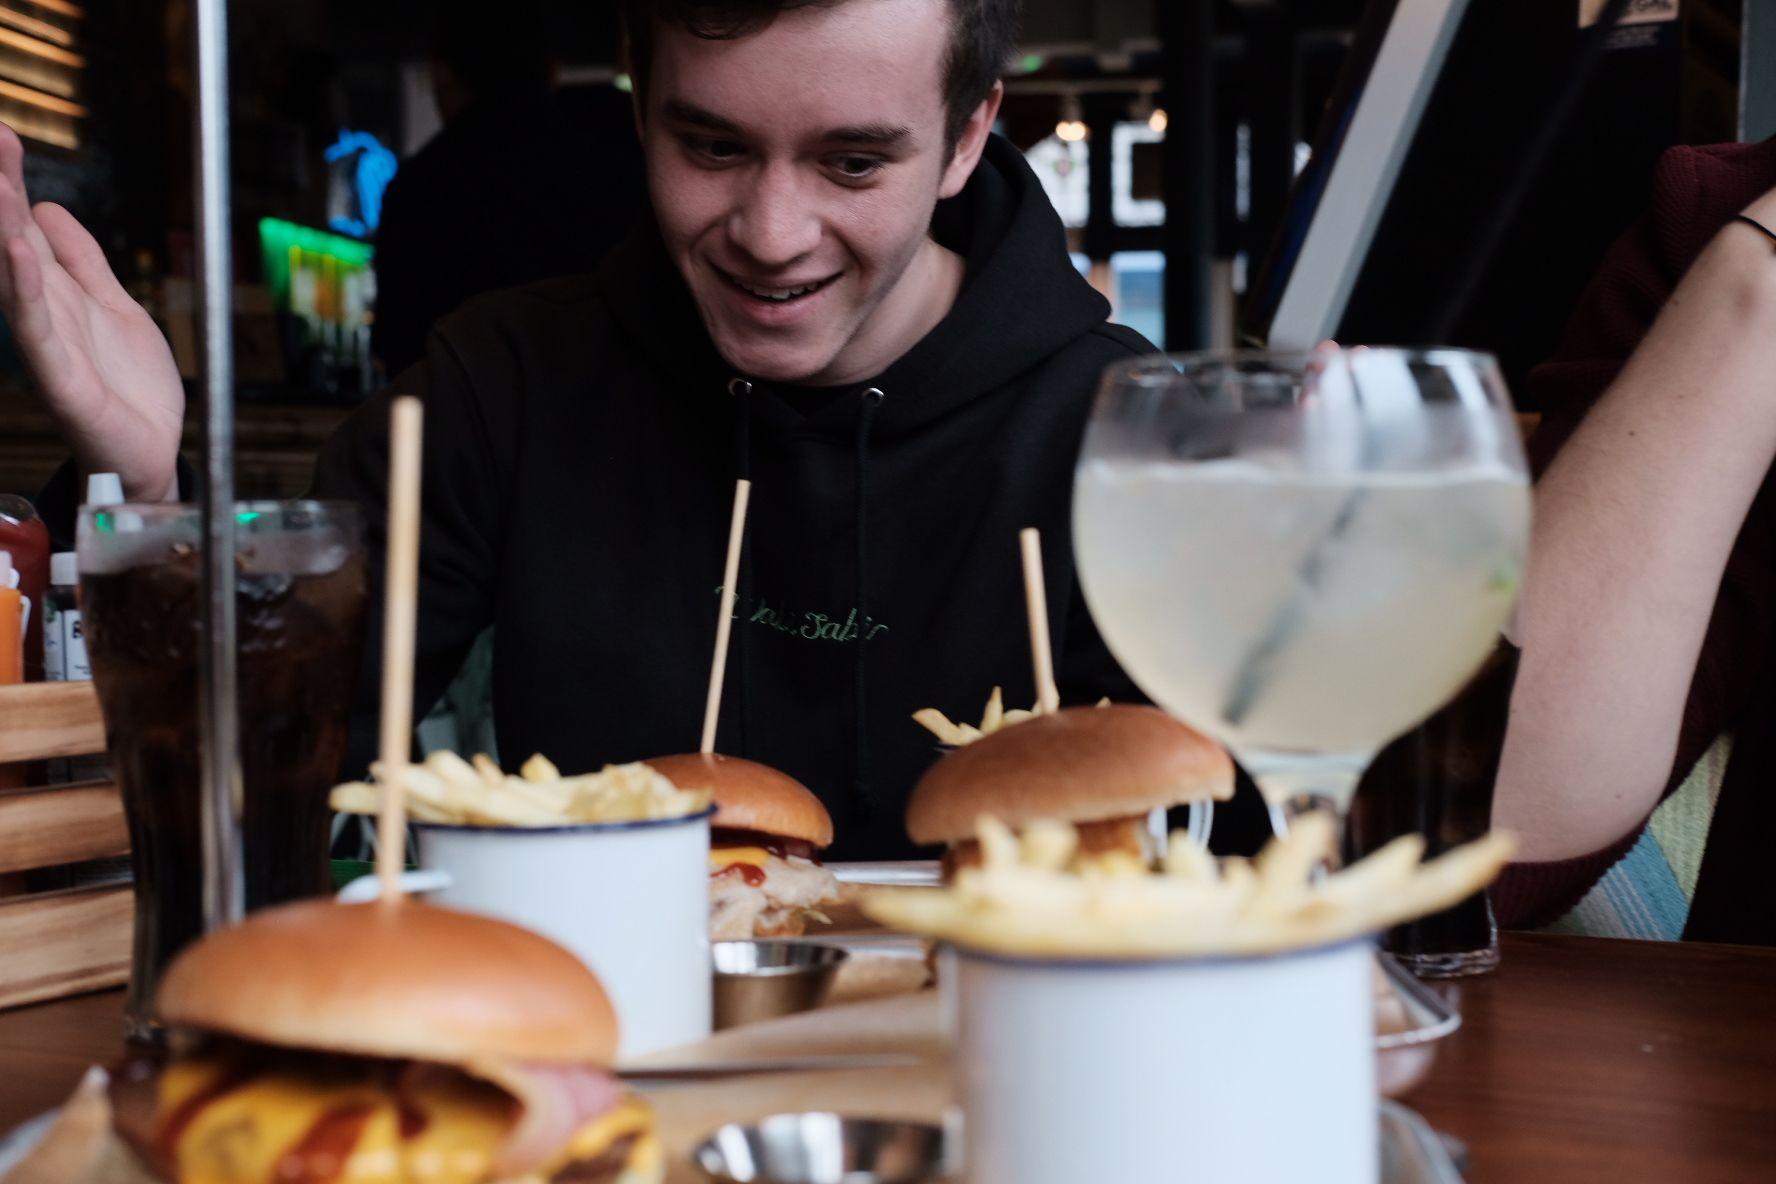 Image may contain: Restaurant, Person, Human, Food, Burger